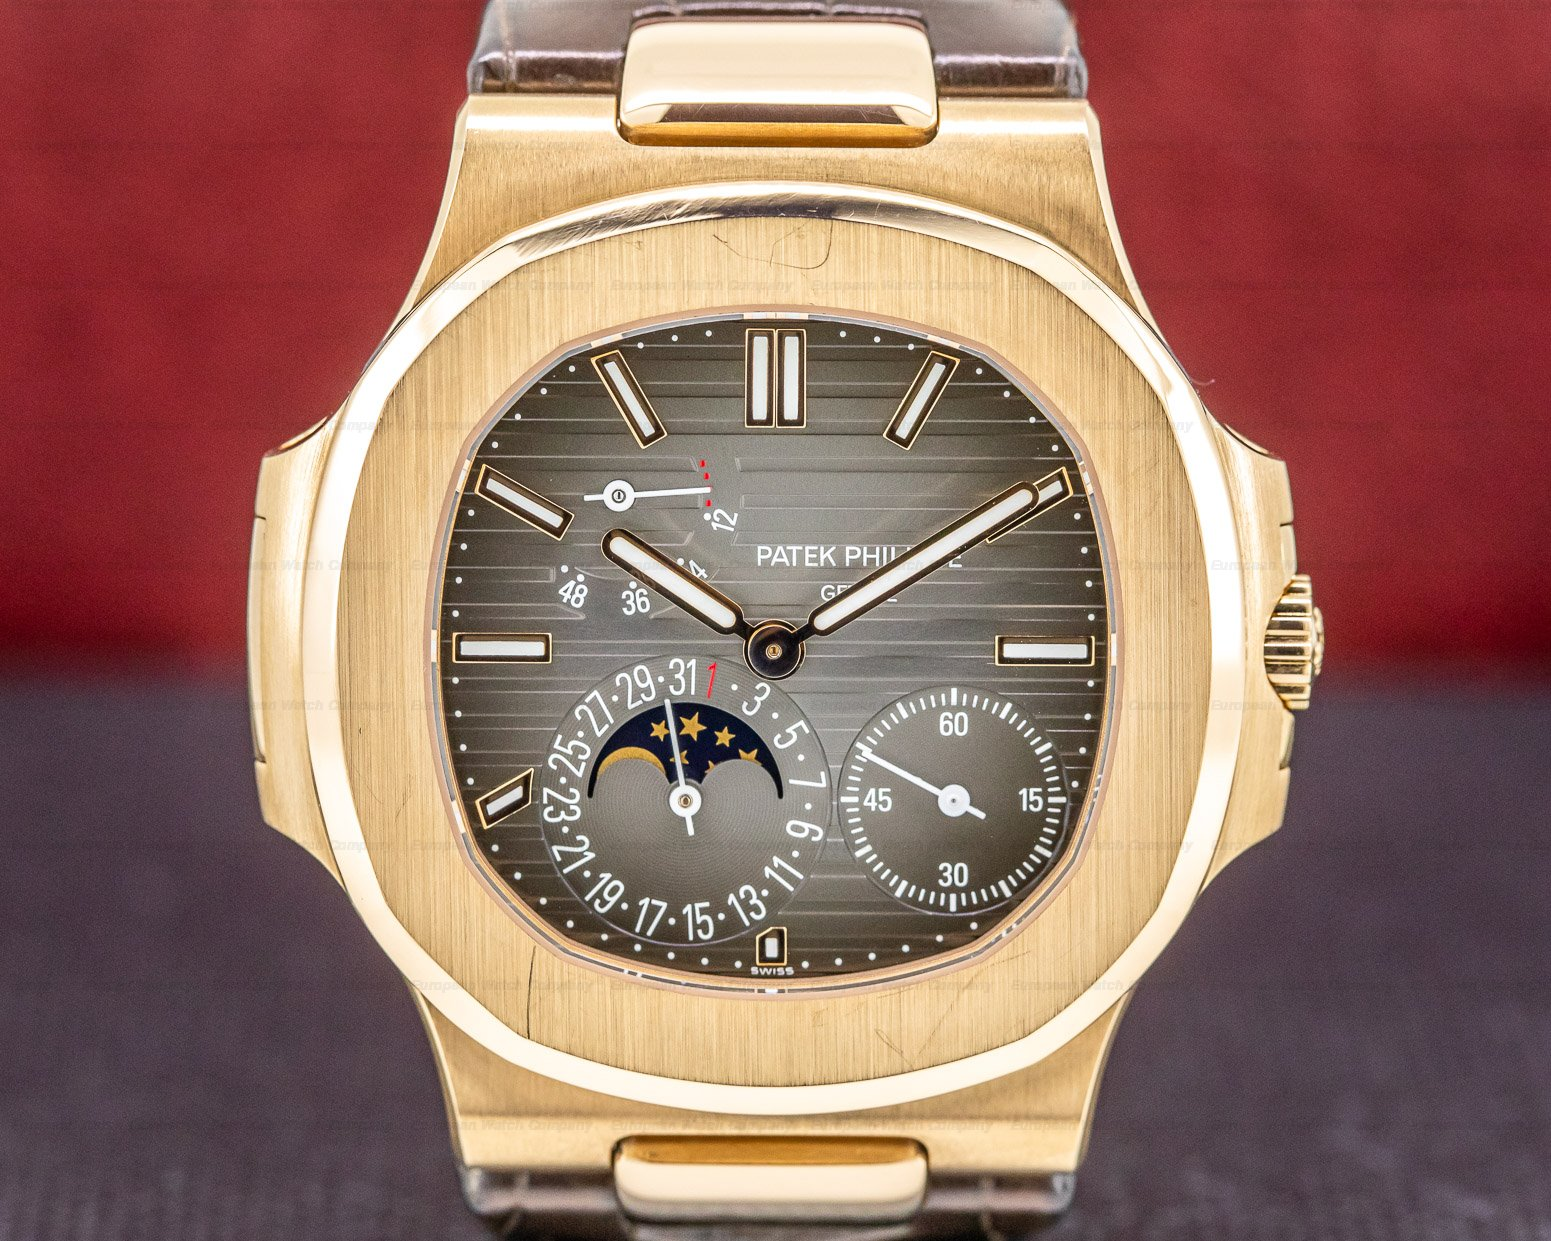 Patek Philippe 5712R-001 Jumbo Nautilus Power Reserve Moon 18K Rose Gold